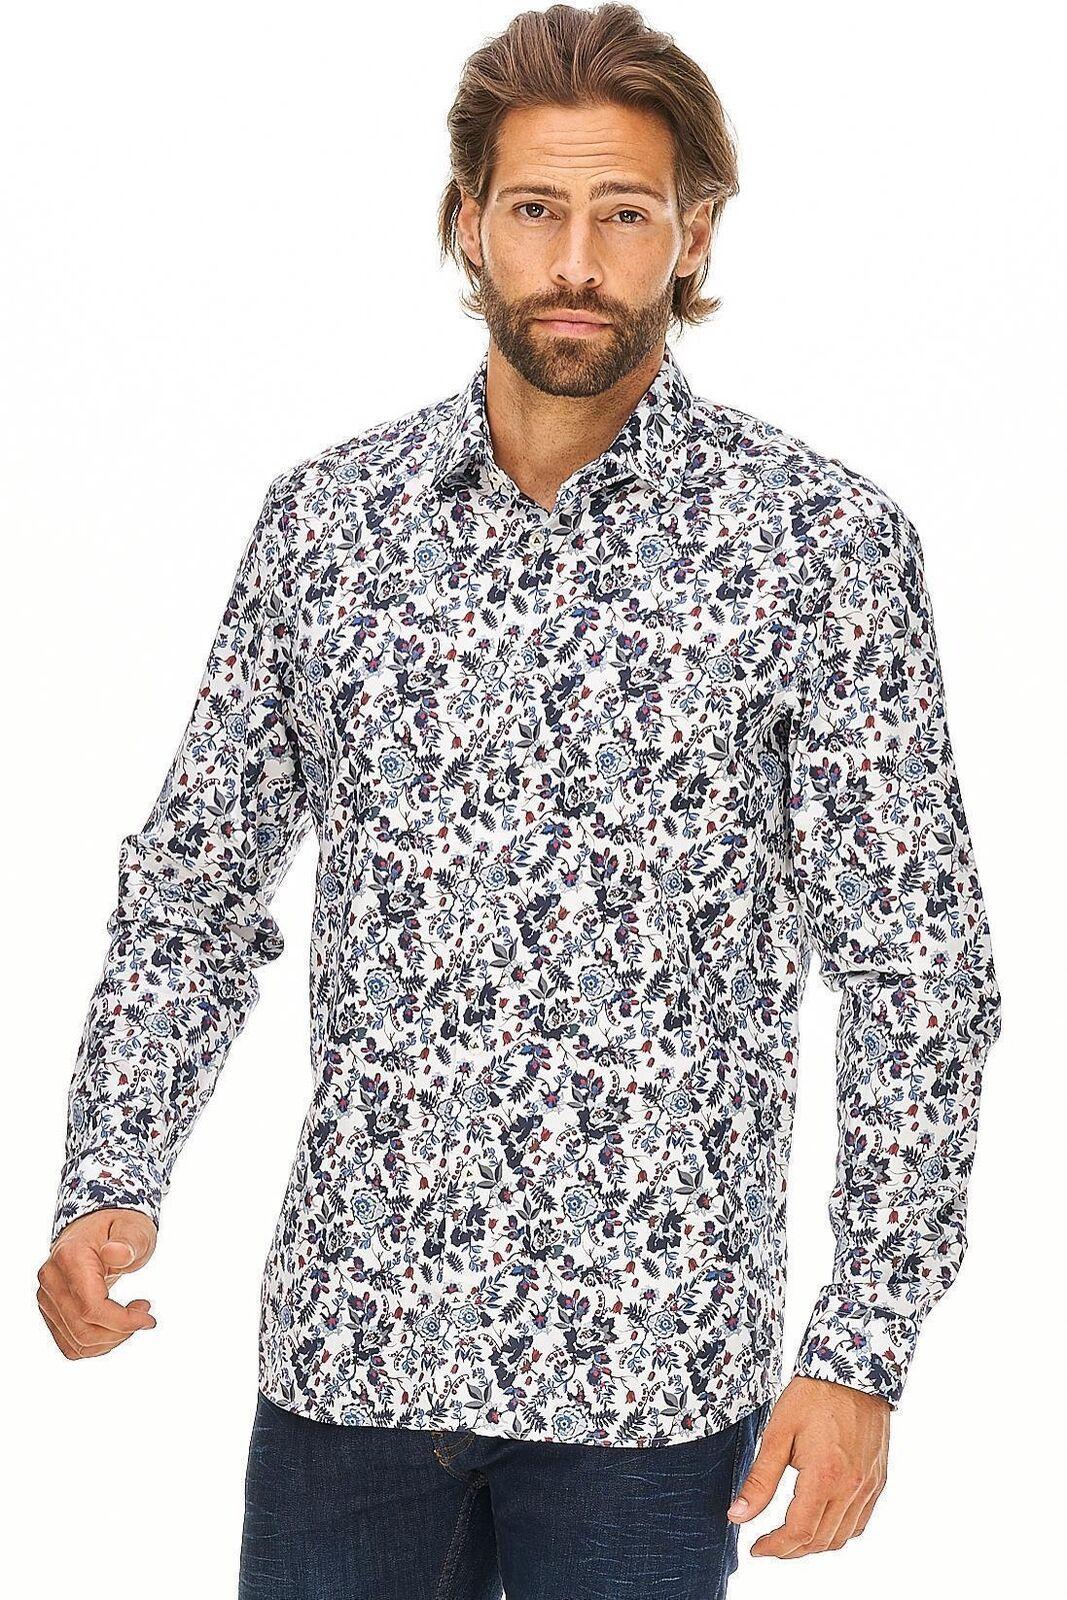 Van Laack-Camicia tet2 Uomo Motivo Floreale Designer Nuovo